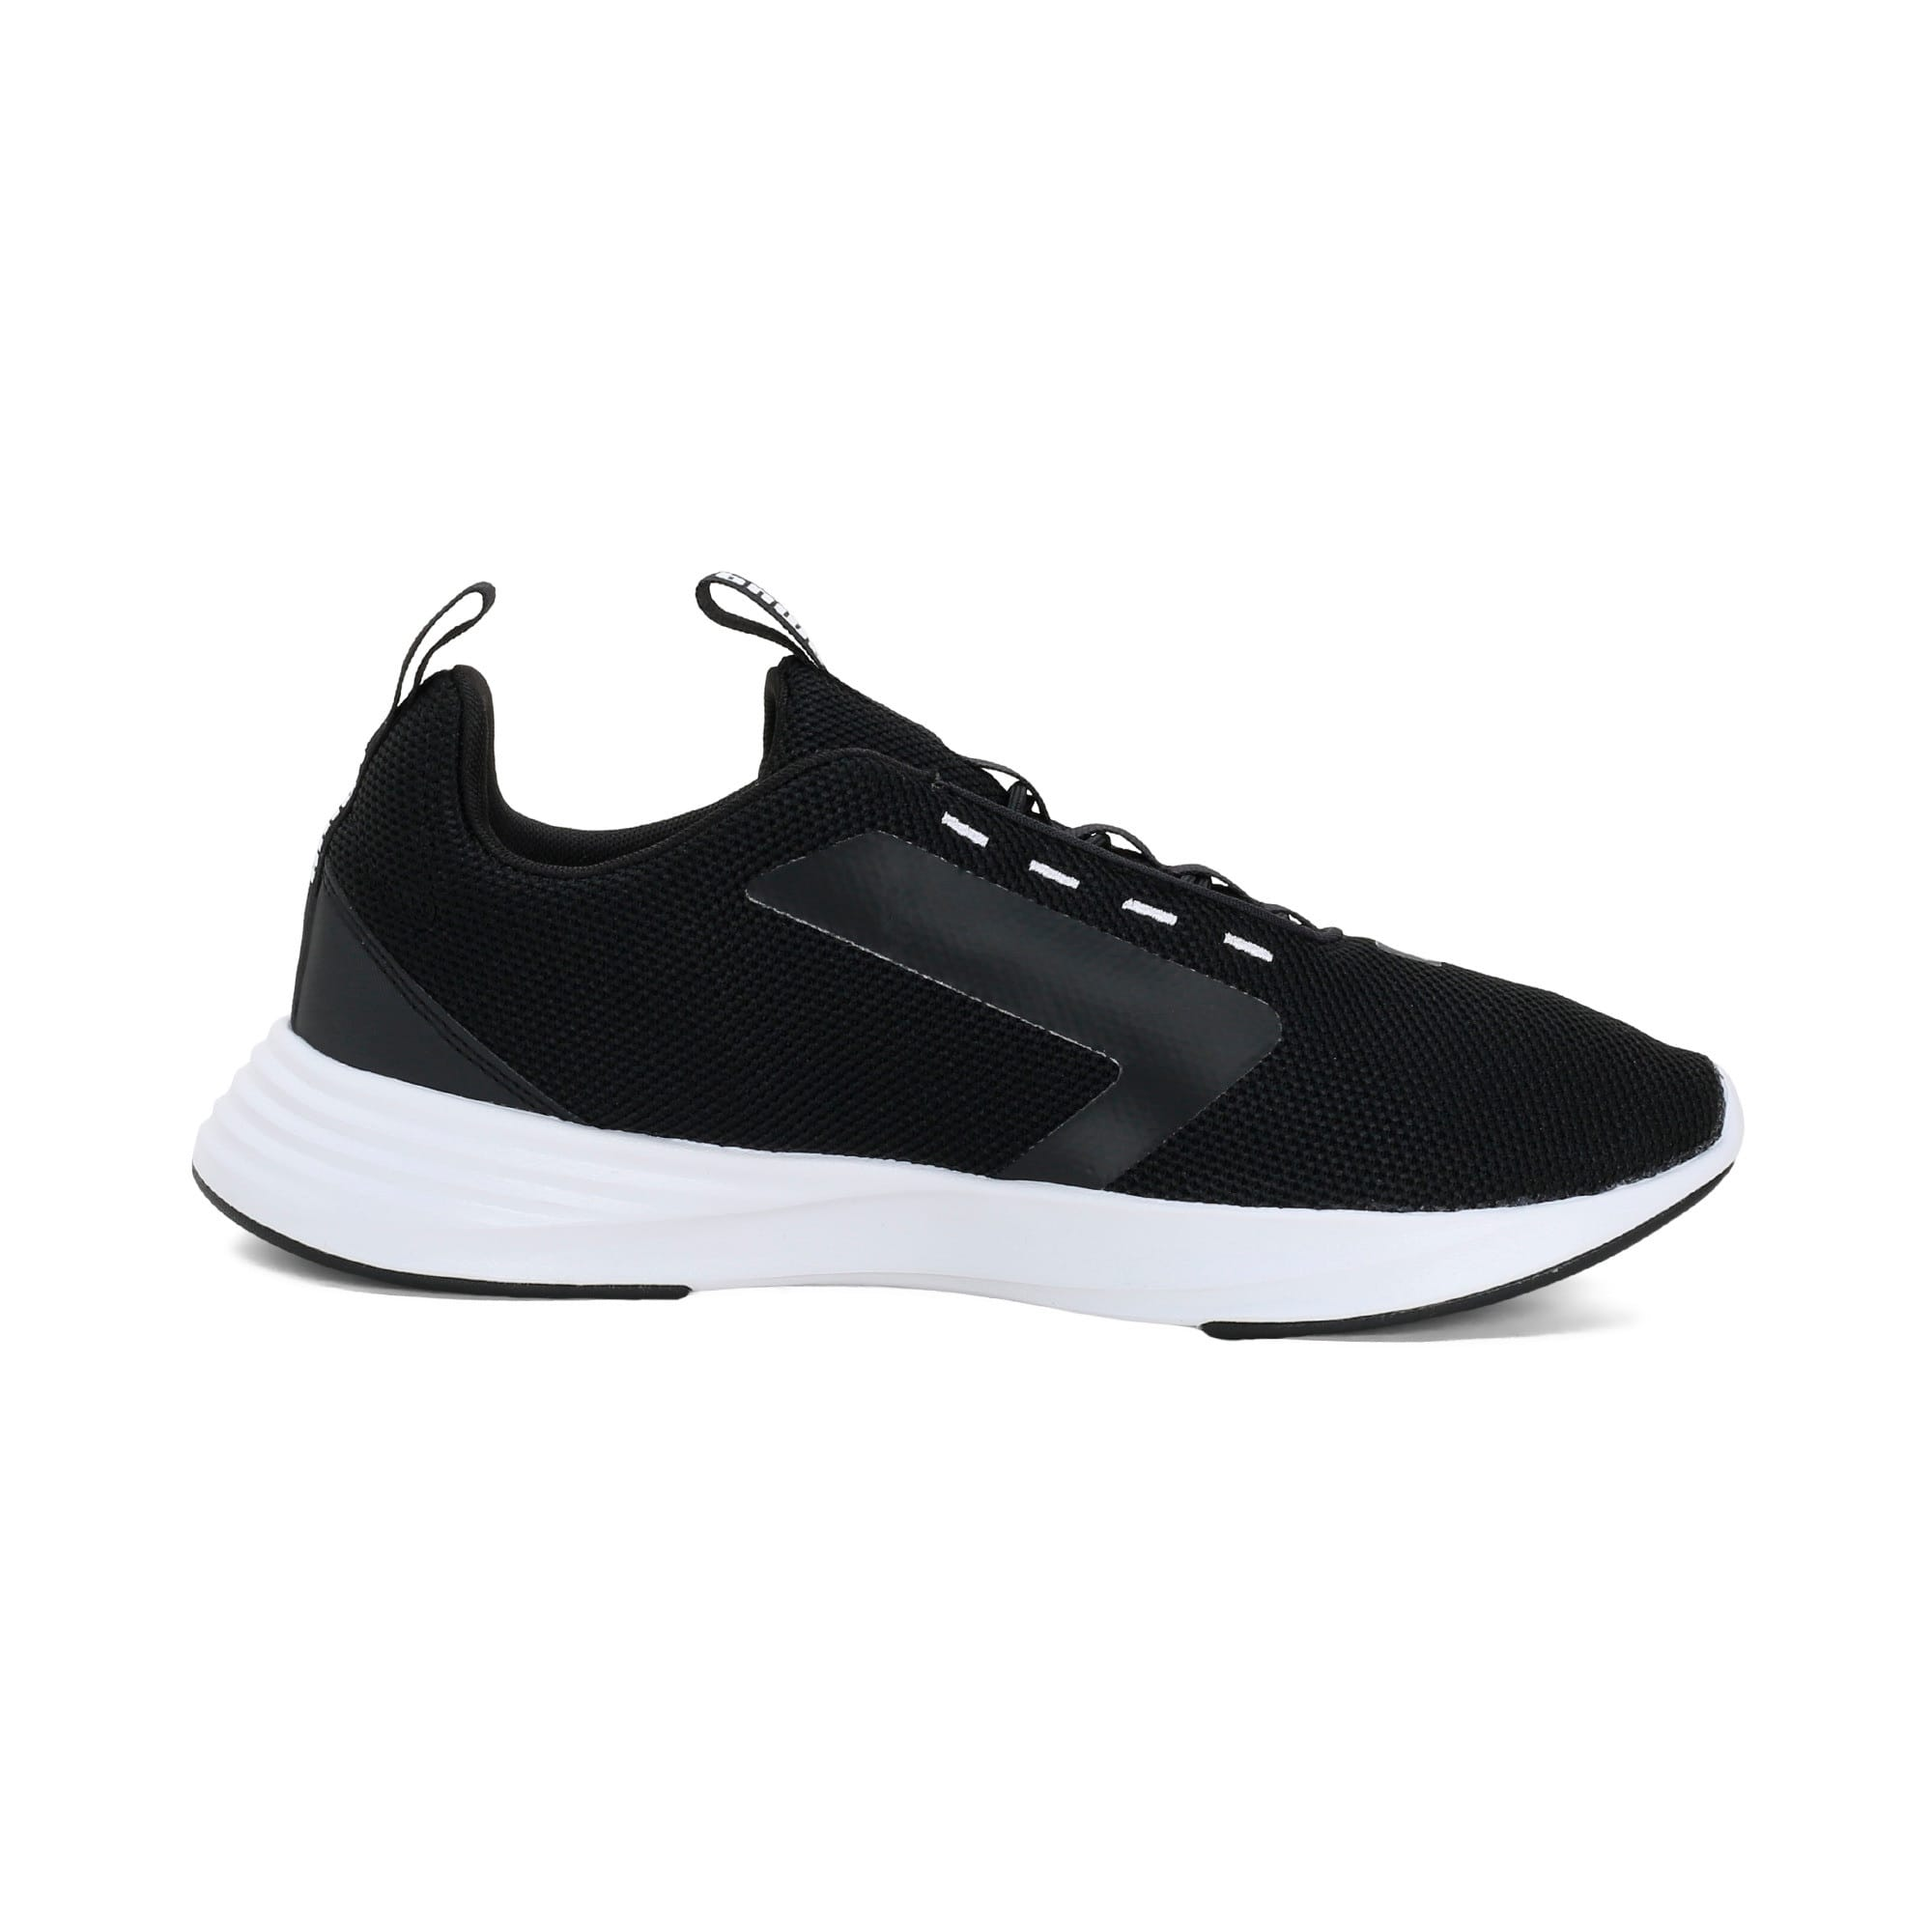 Thumbnail 5 of Extractor Running Shoes, Puma Black-Puma White, medium-IND